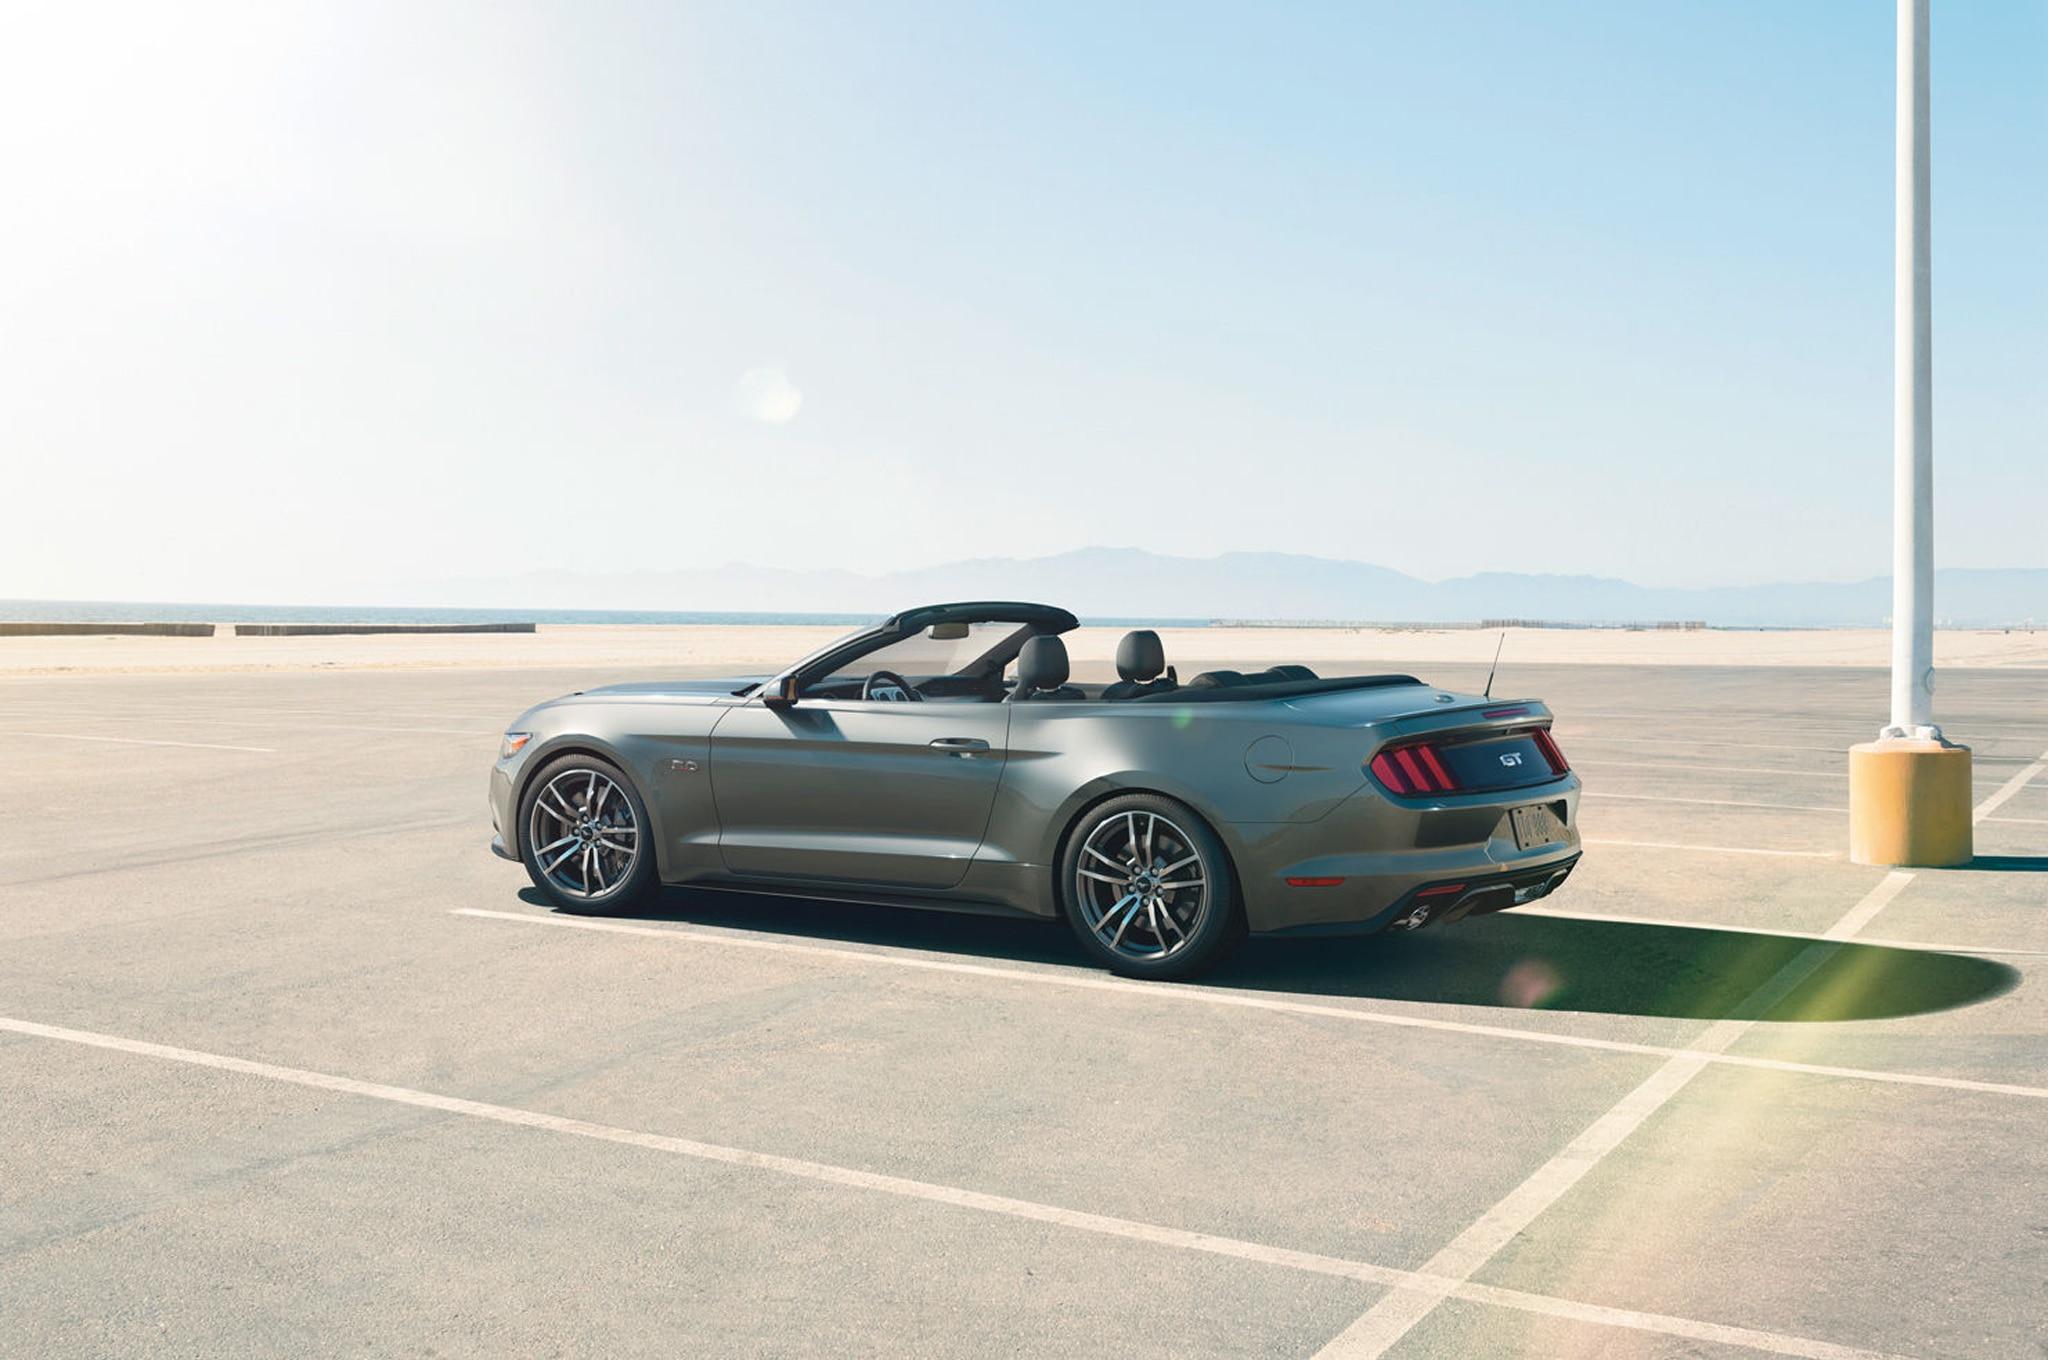 2015 Ford Mustang Convertible Rear Three Quarter1